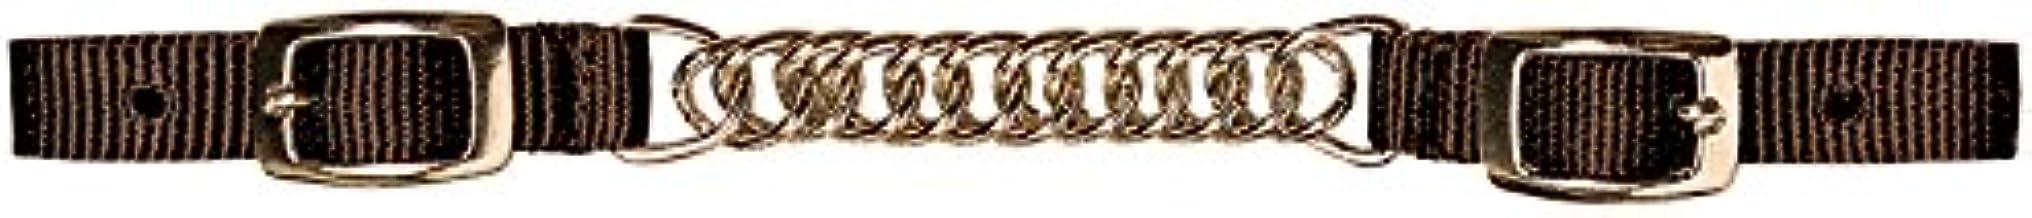 Weaver Leather Nylon Curb Strap